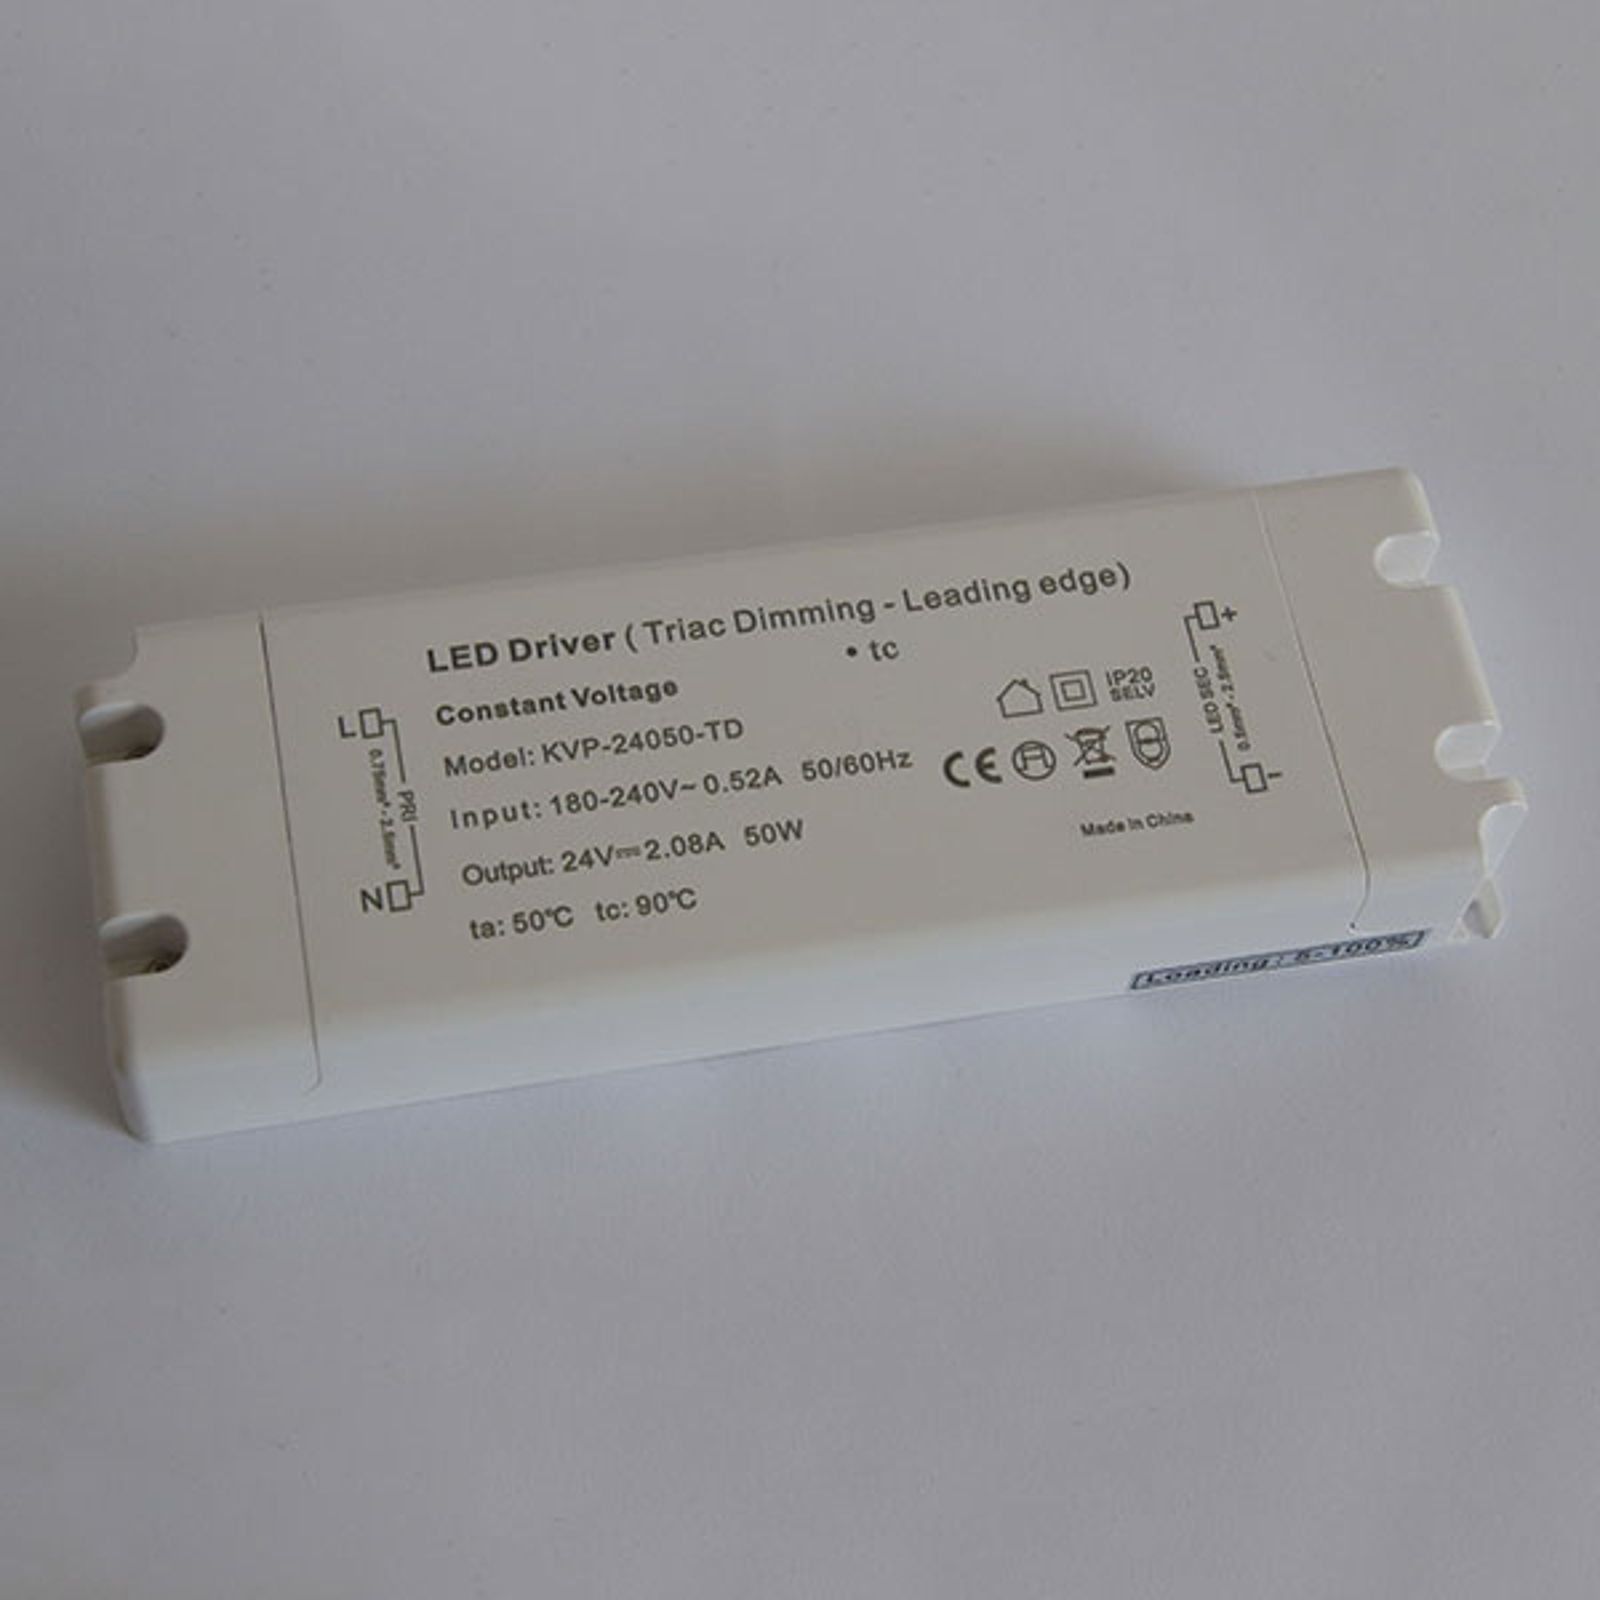 Alimentatore TRIAC dimming IP20 LED 50W